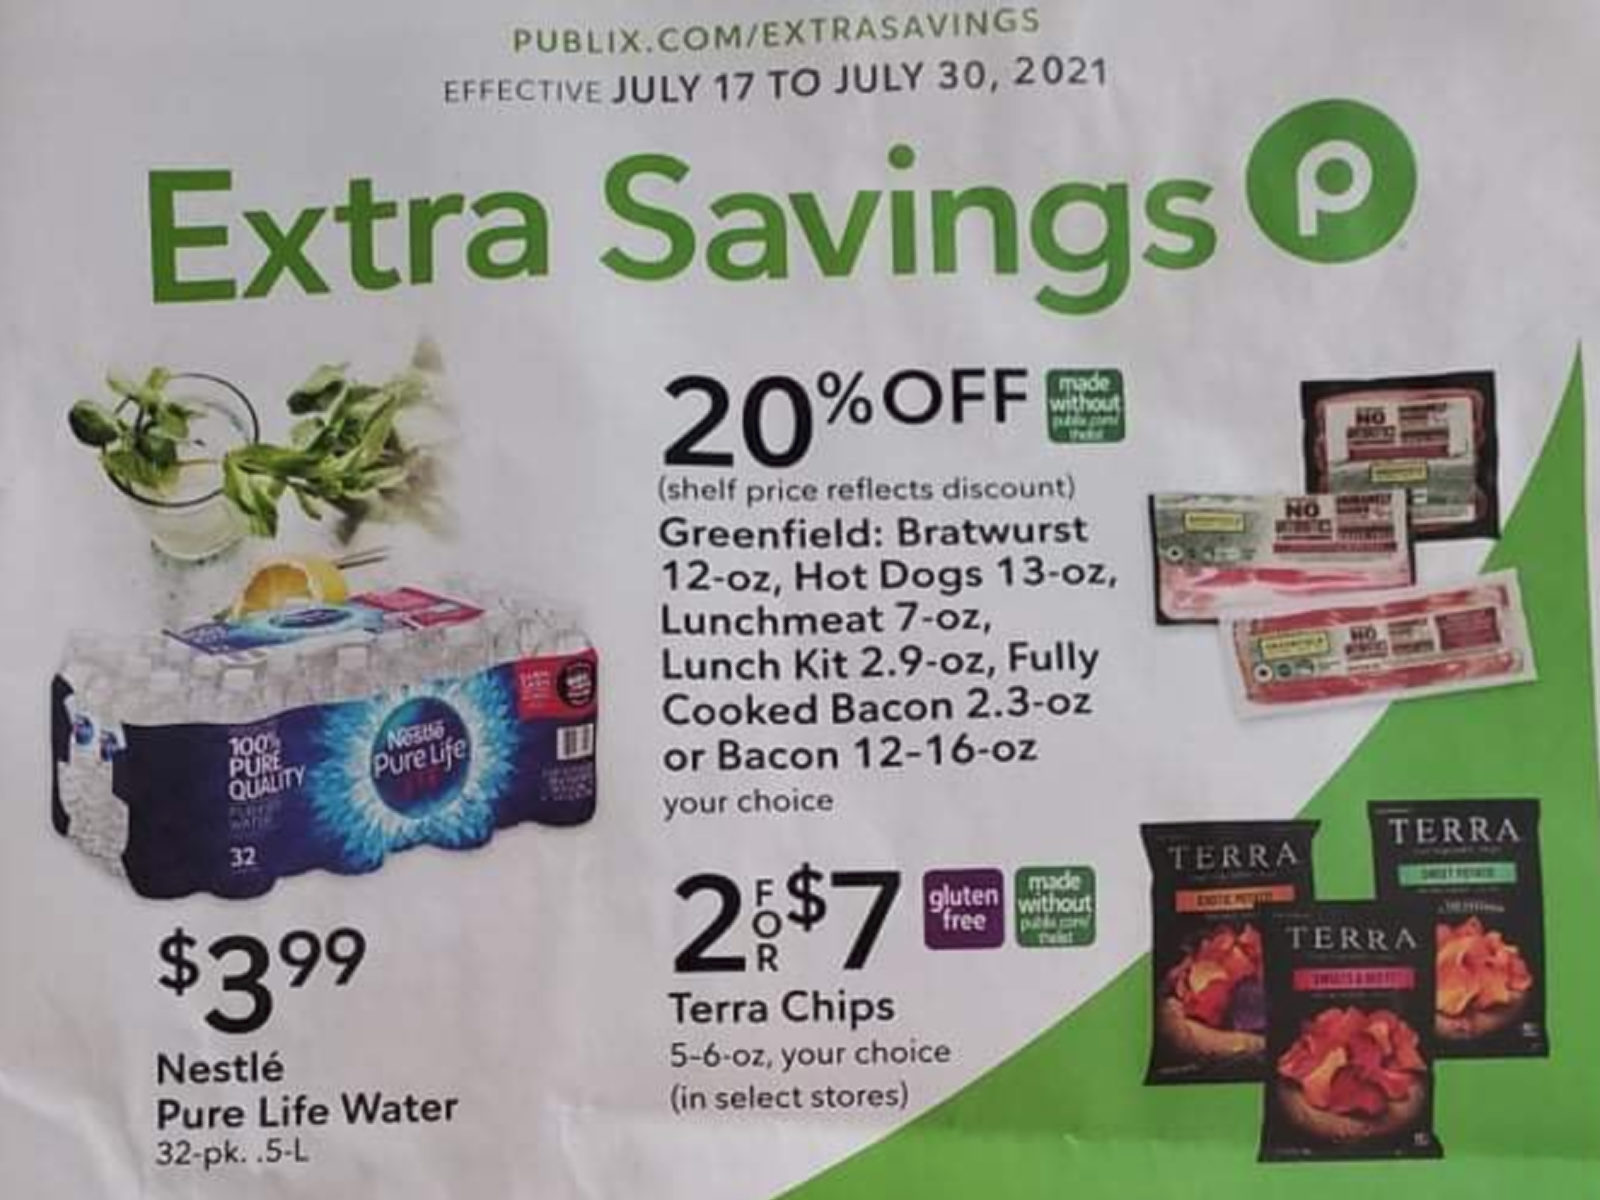 Publix Extra Savings Flyer Valid 7/17 to 7/30 on I Heart Publix